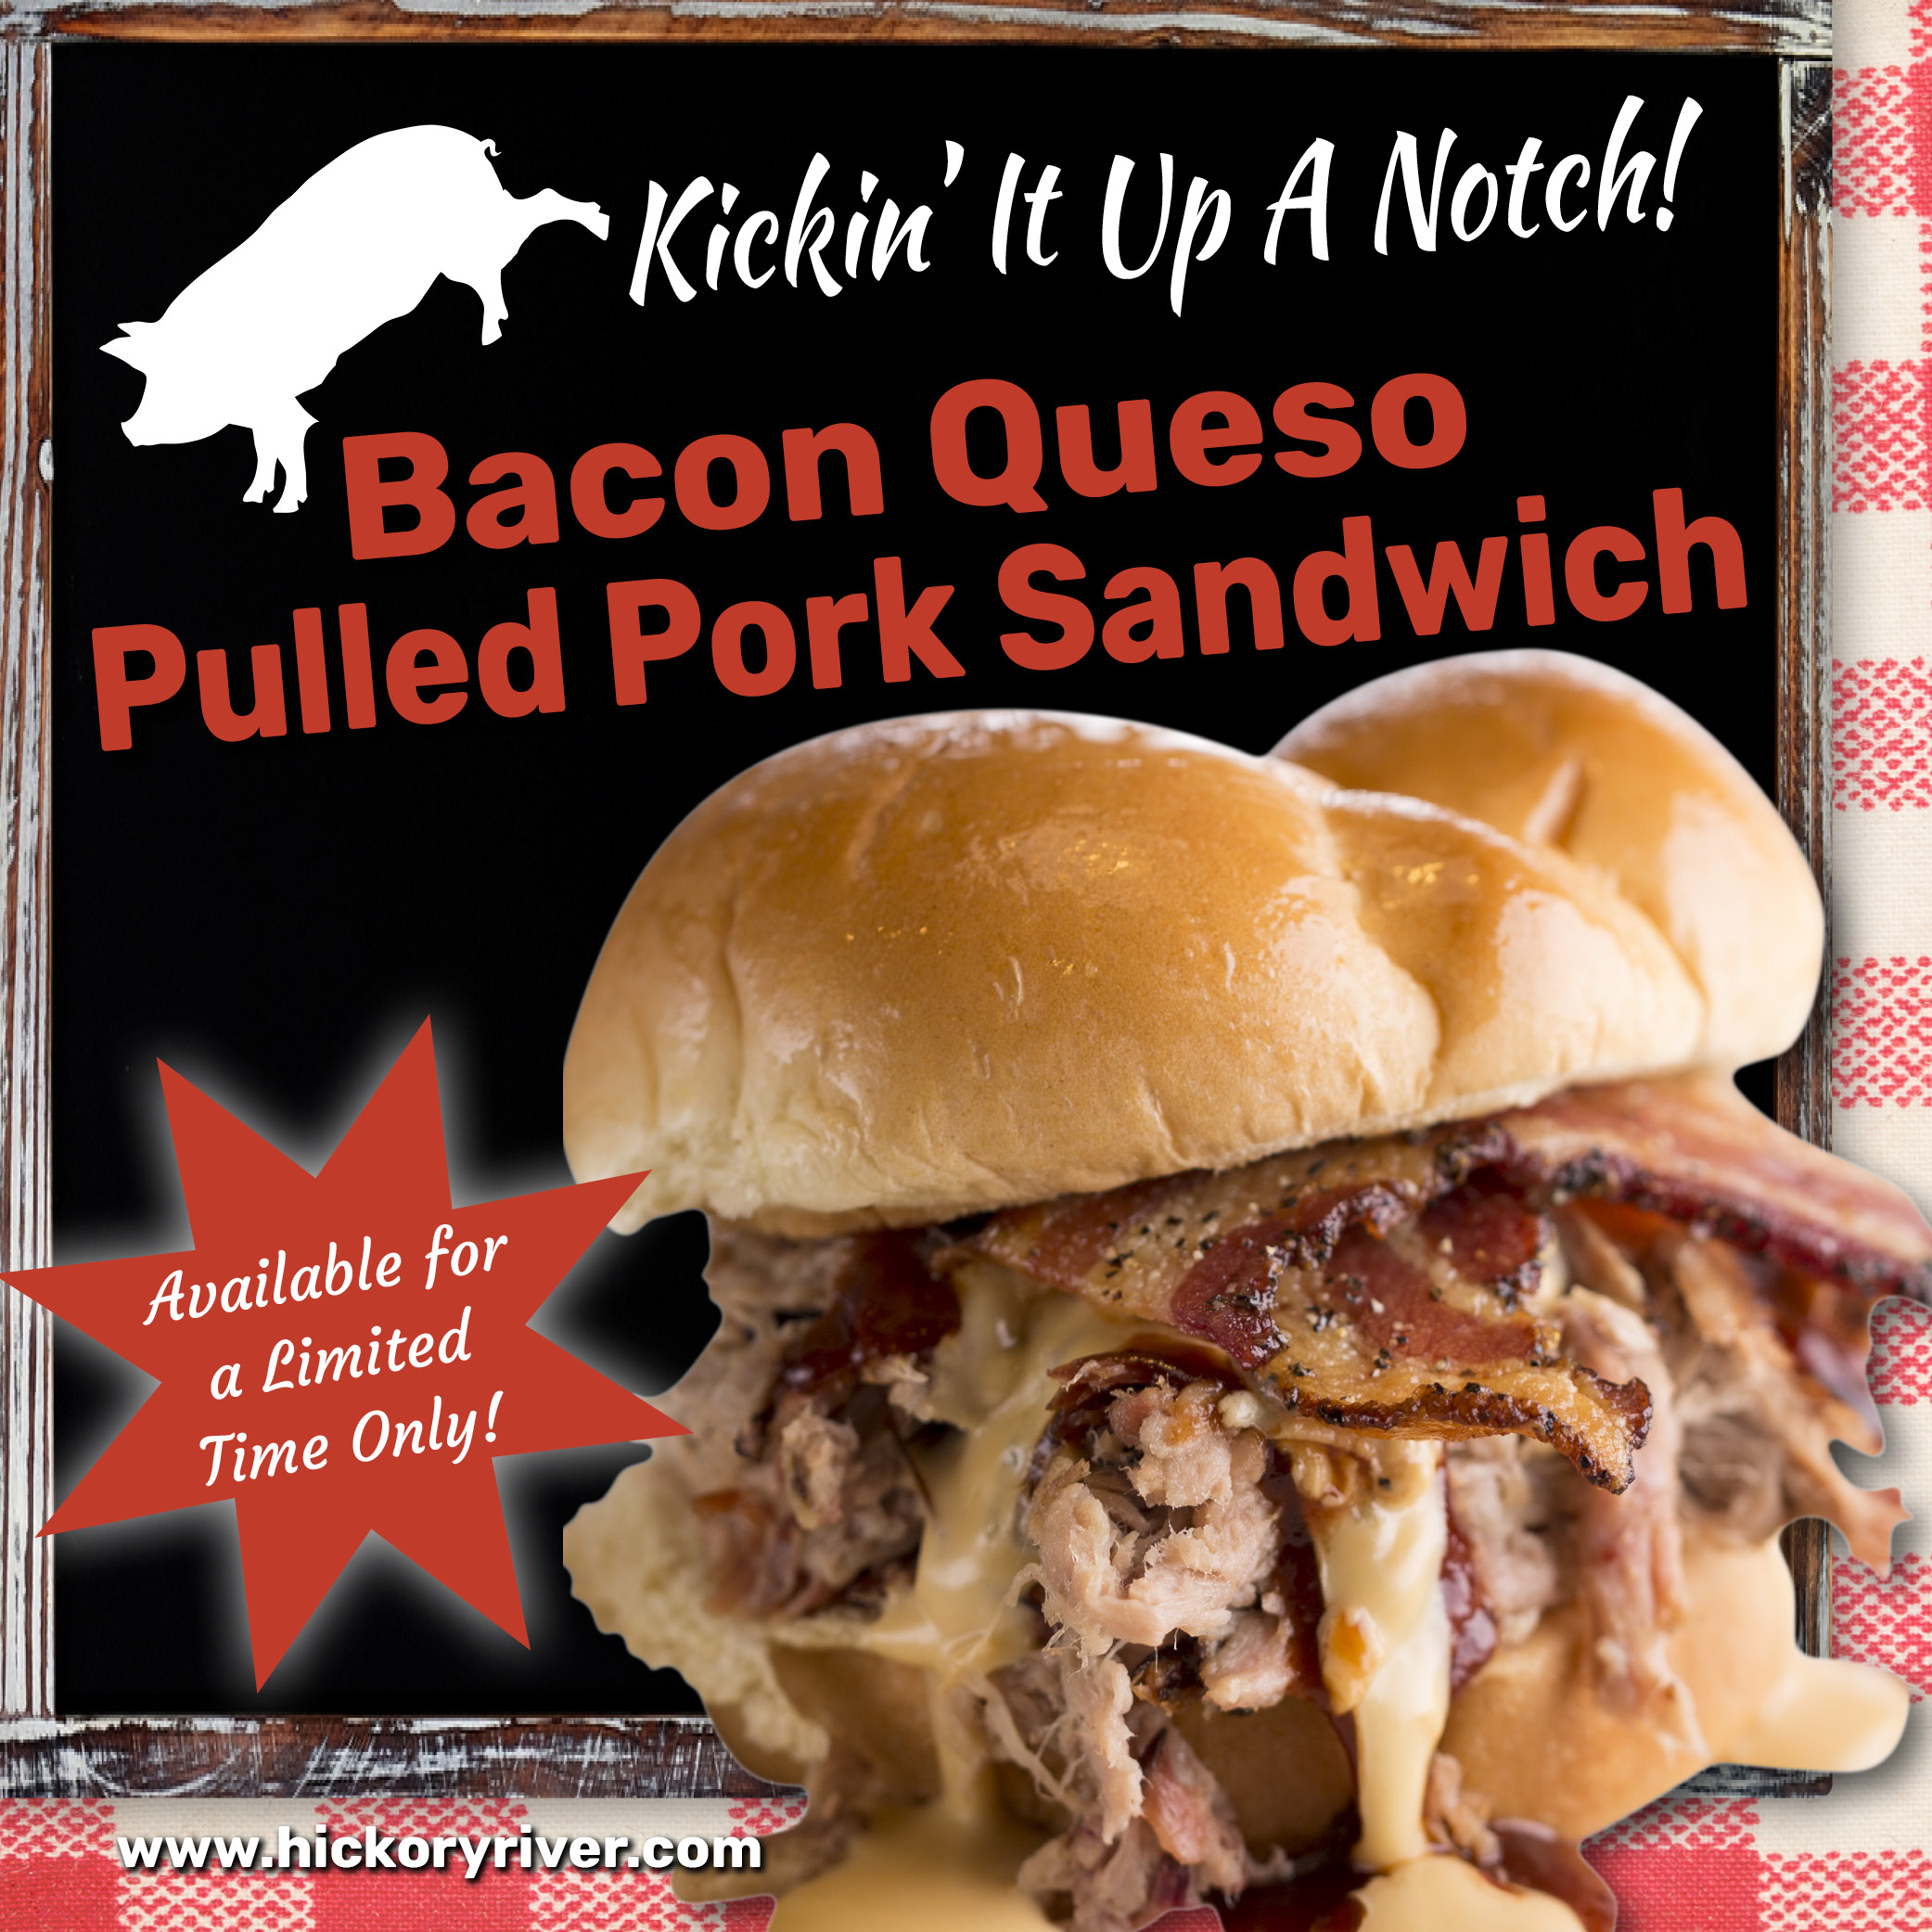 202 First Quarter Promotion Sandwich